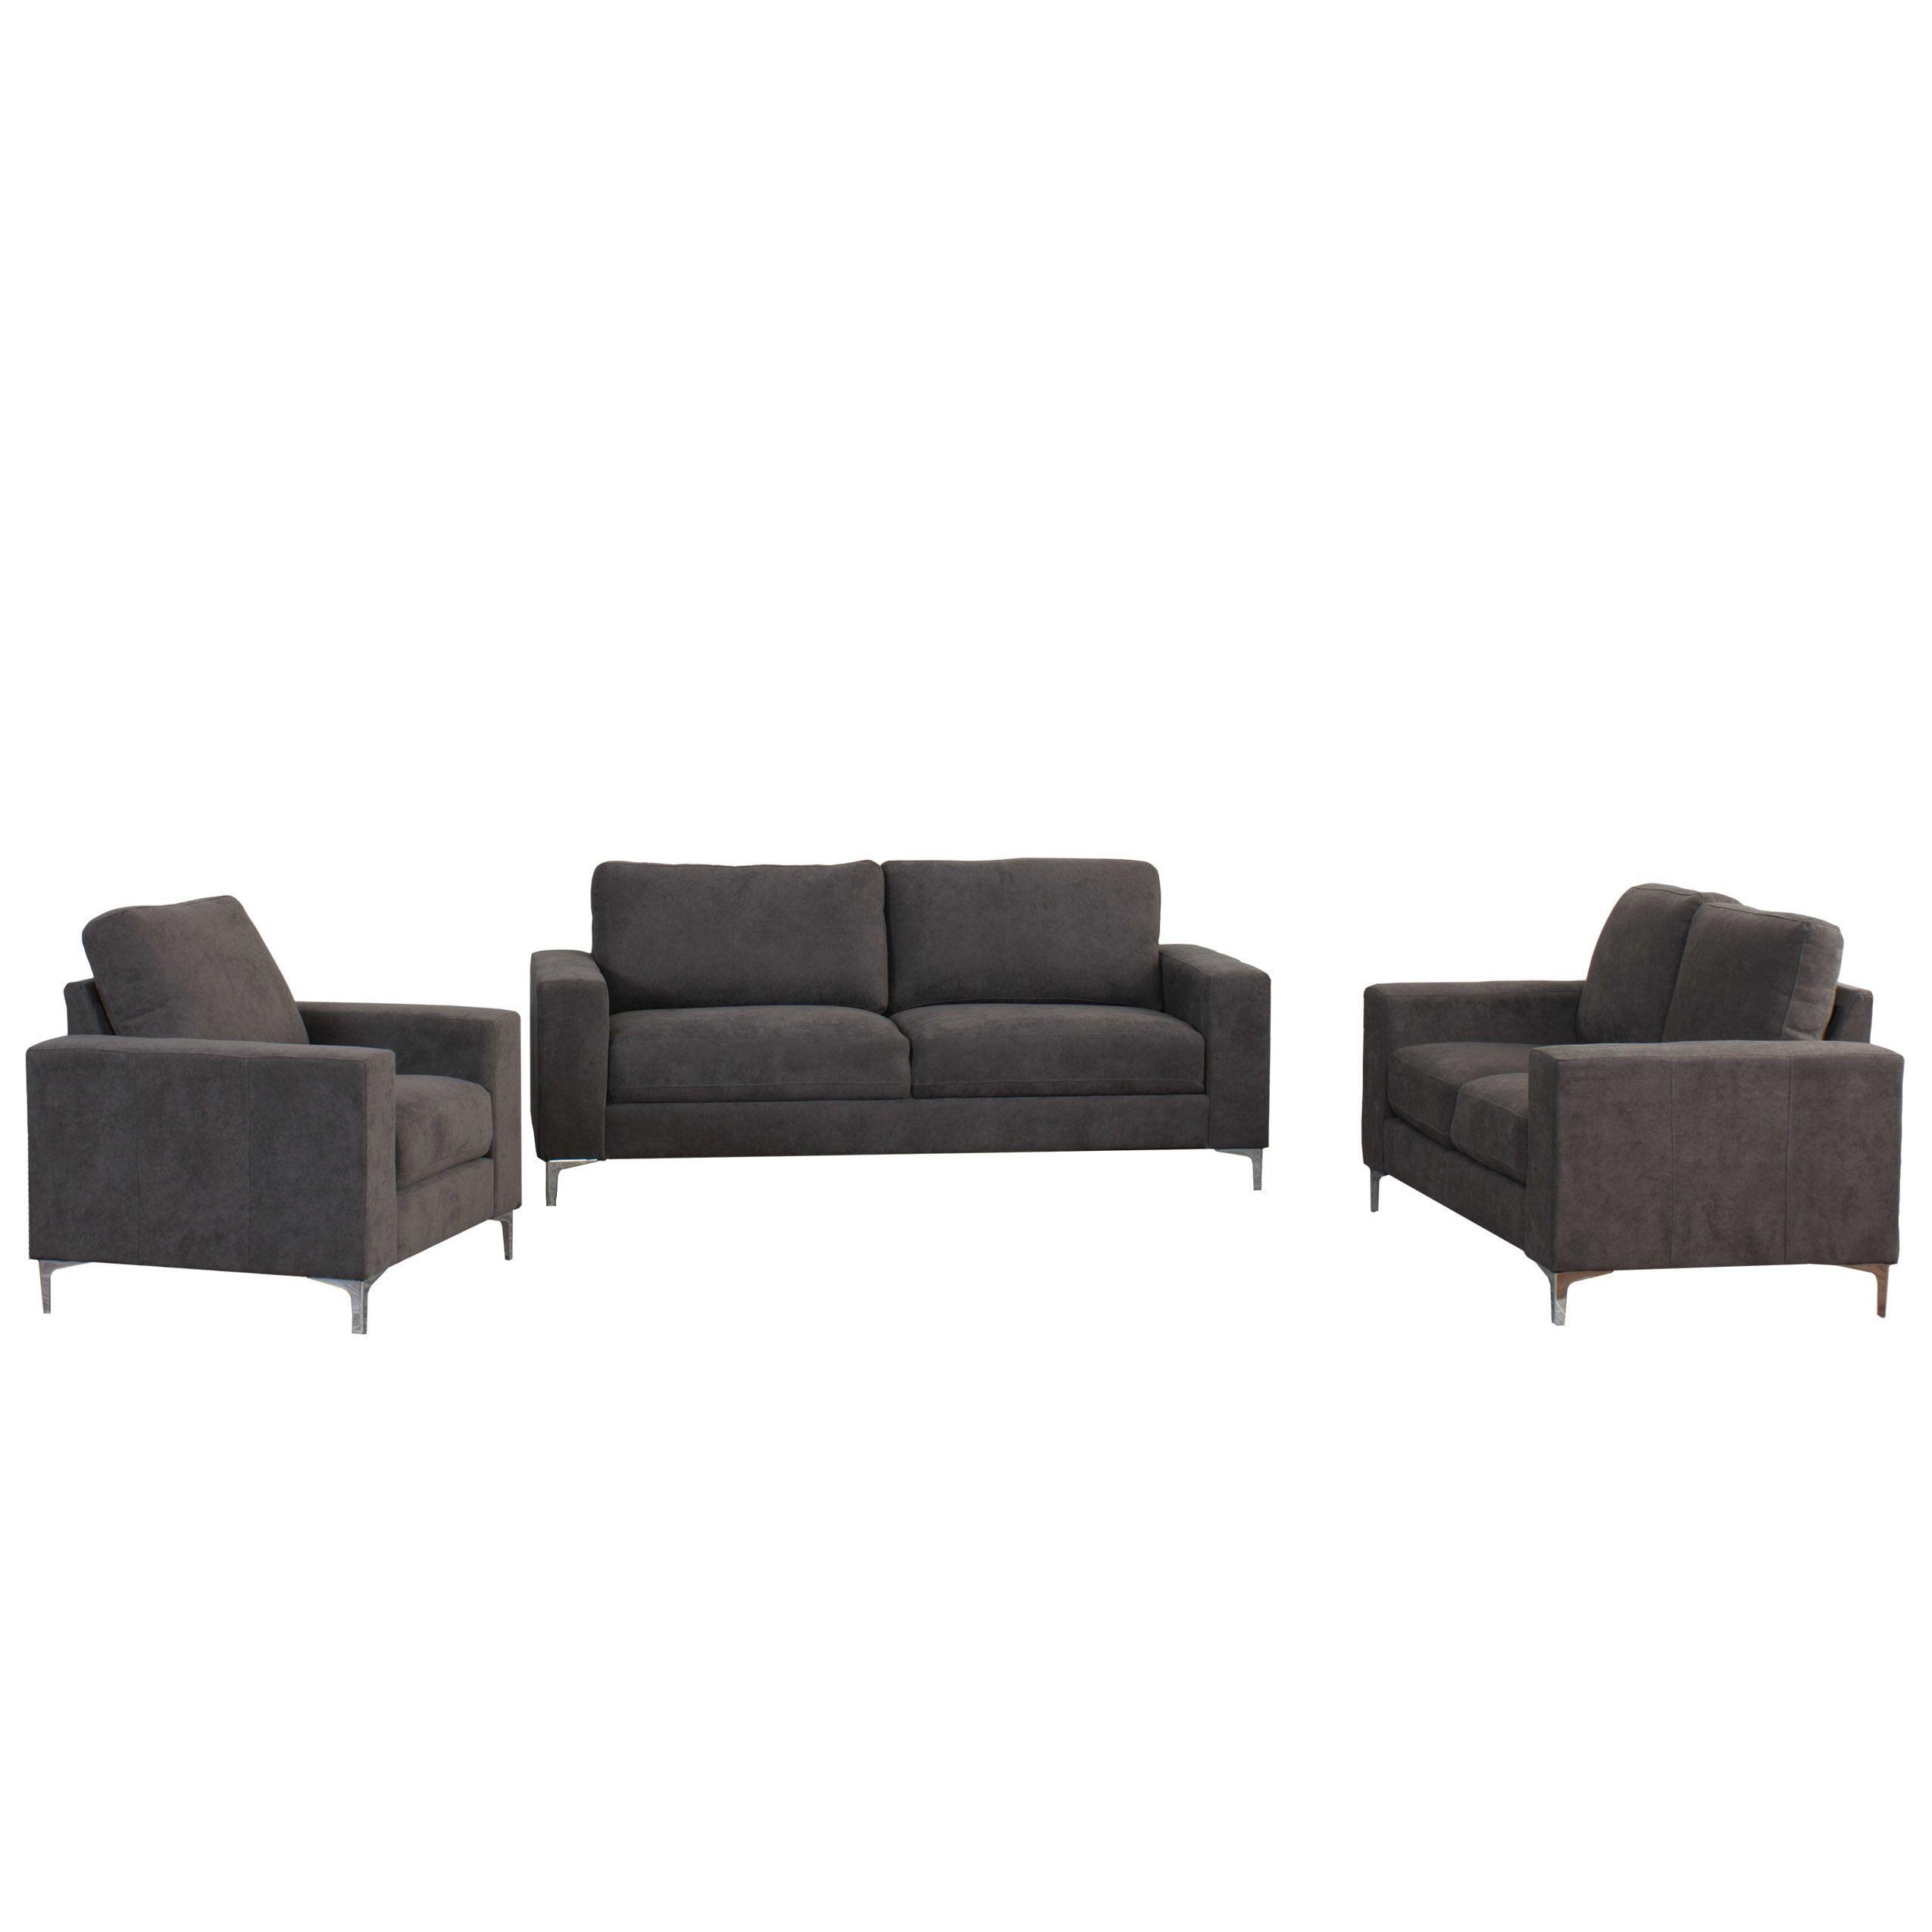 CorLiving Cory 3pc Chenille Fabric Sofa Set Grey